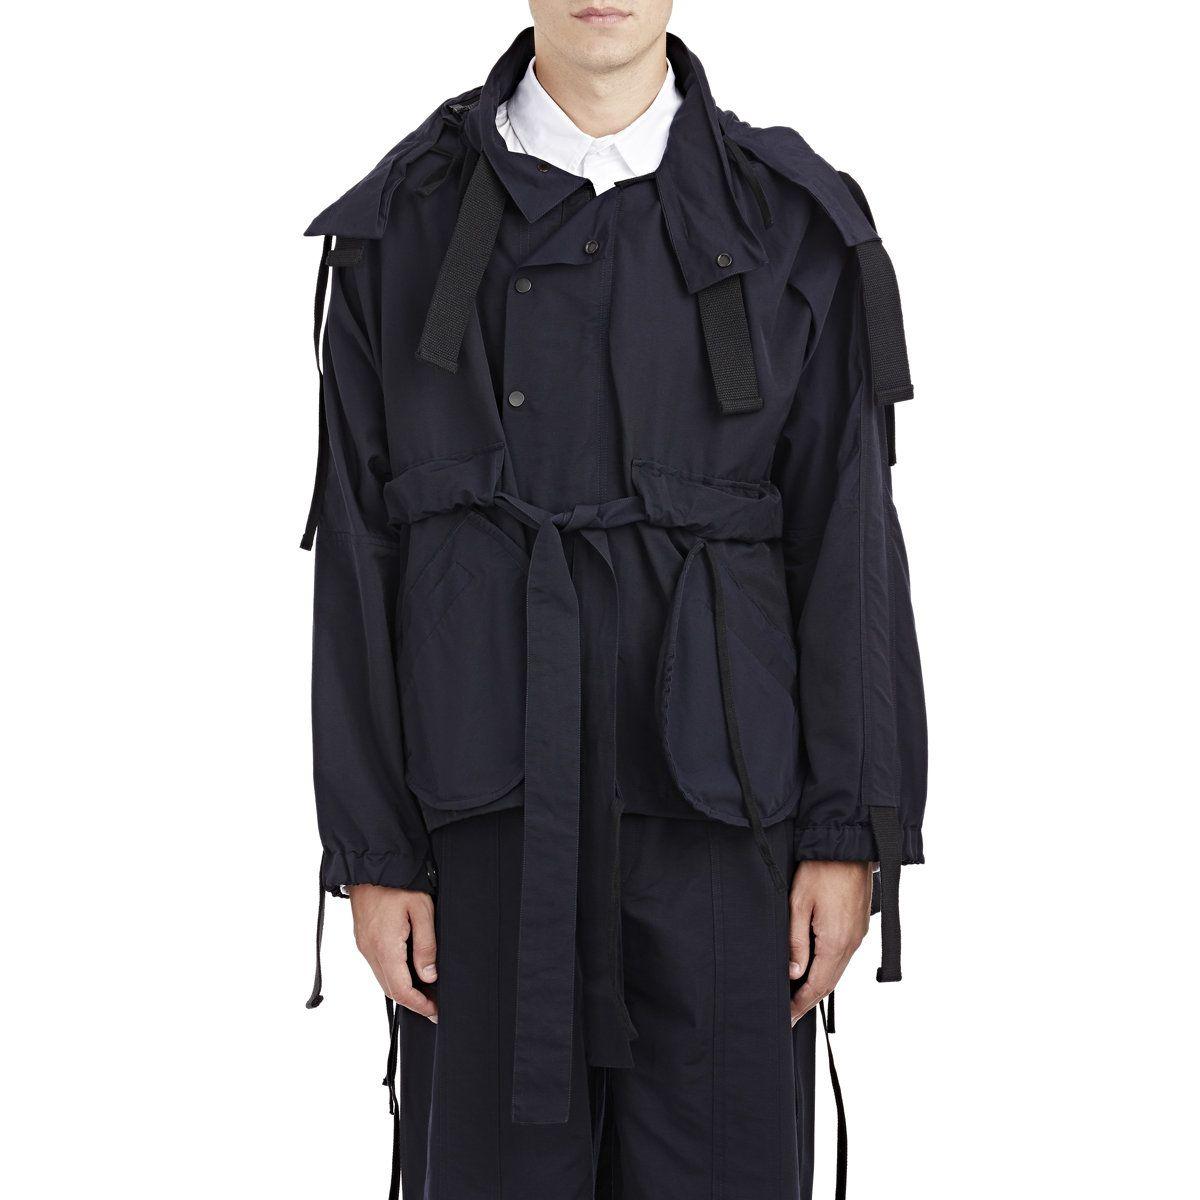 Parachute_Jacket